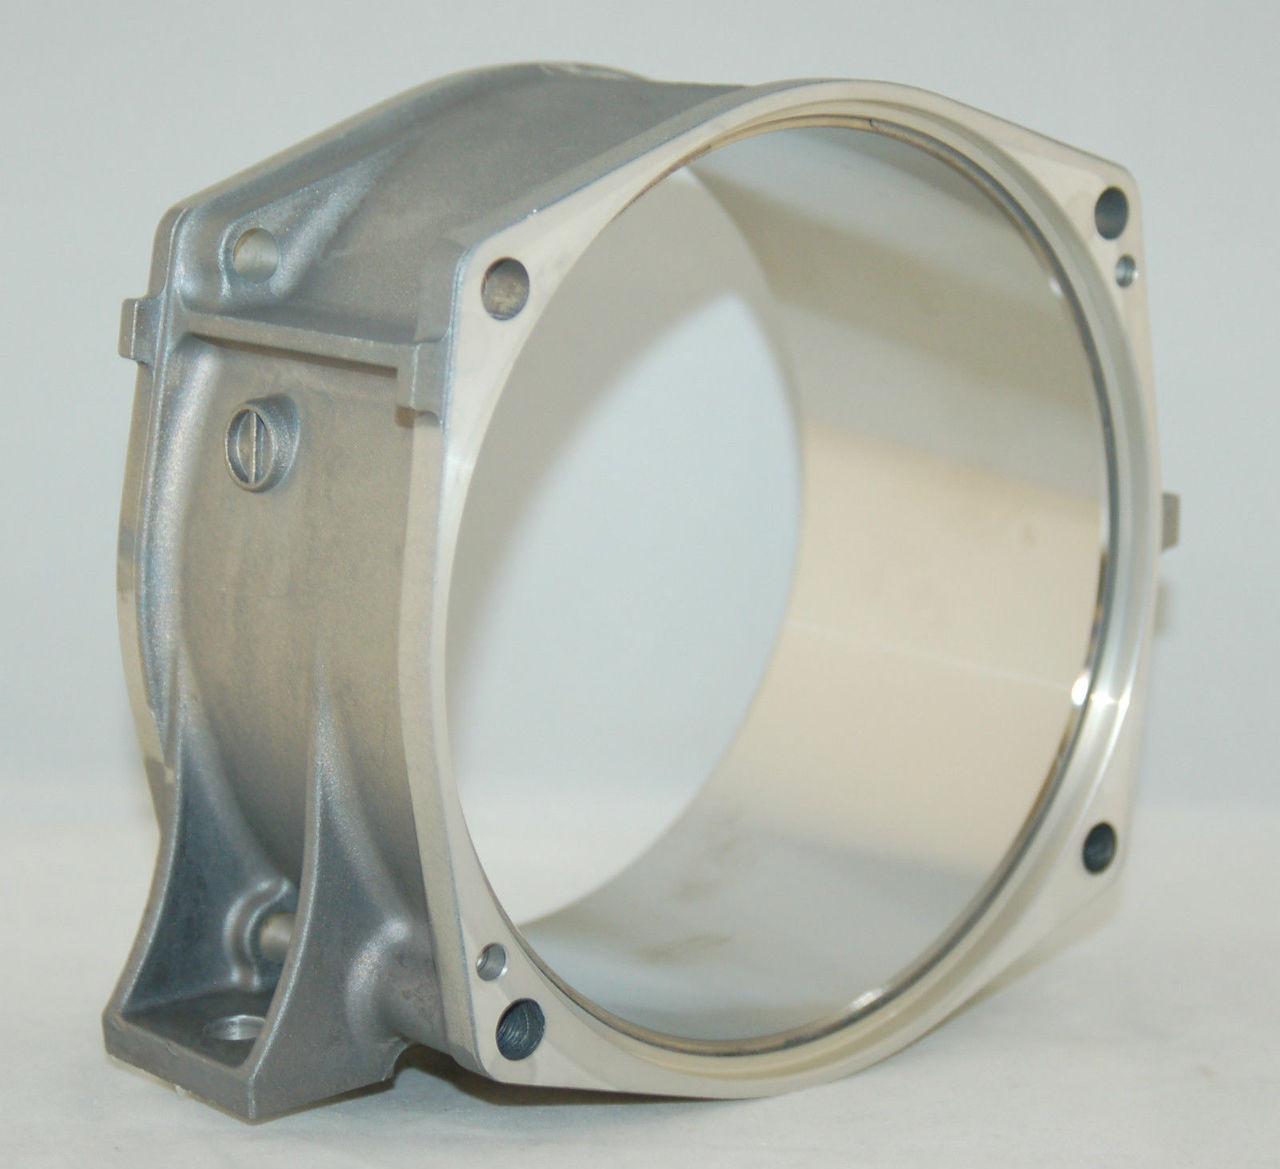 YAMAHA Jet Pump Impeller Housing XL700 GP1200 AR210 Wear Ring  63M-51312-02-94